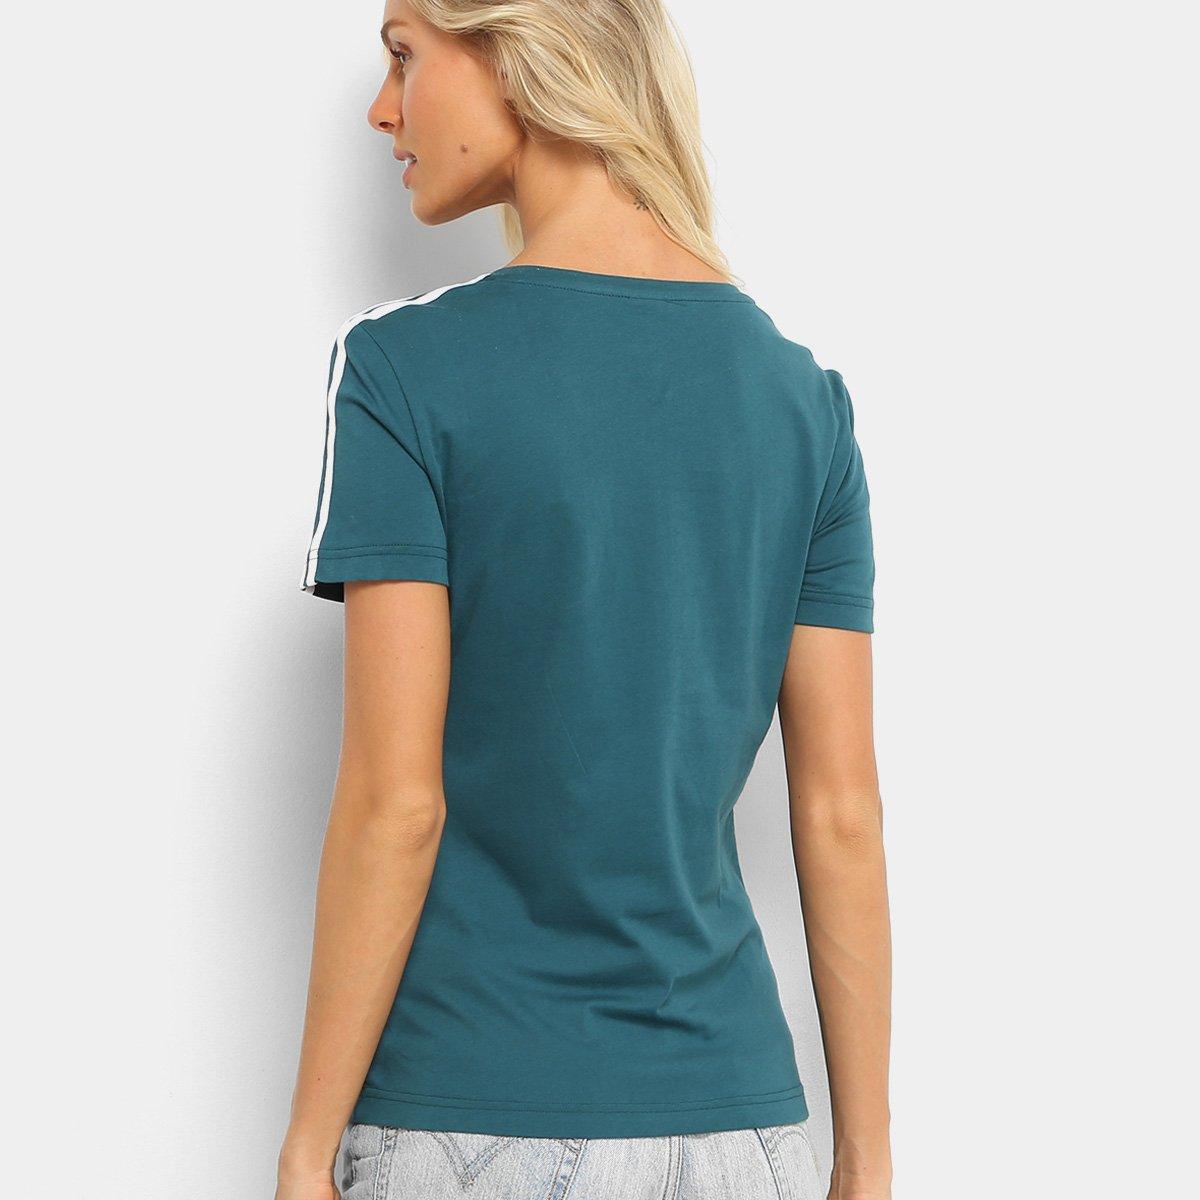 Camiseta Adidas Verde Camiseta Feminina Adidas 3Stripes 3Stripes Palmeiras Palmeiras rRwxCAqr